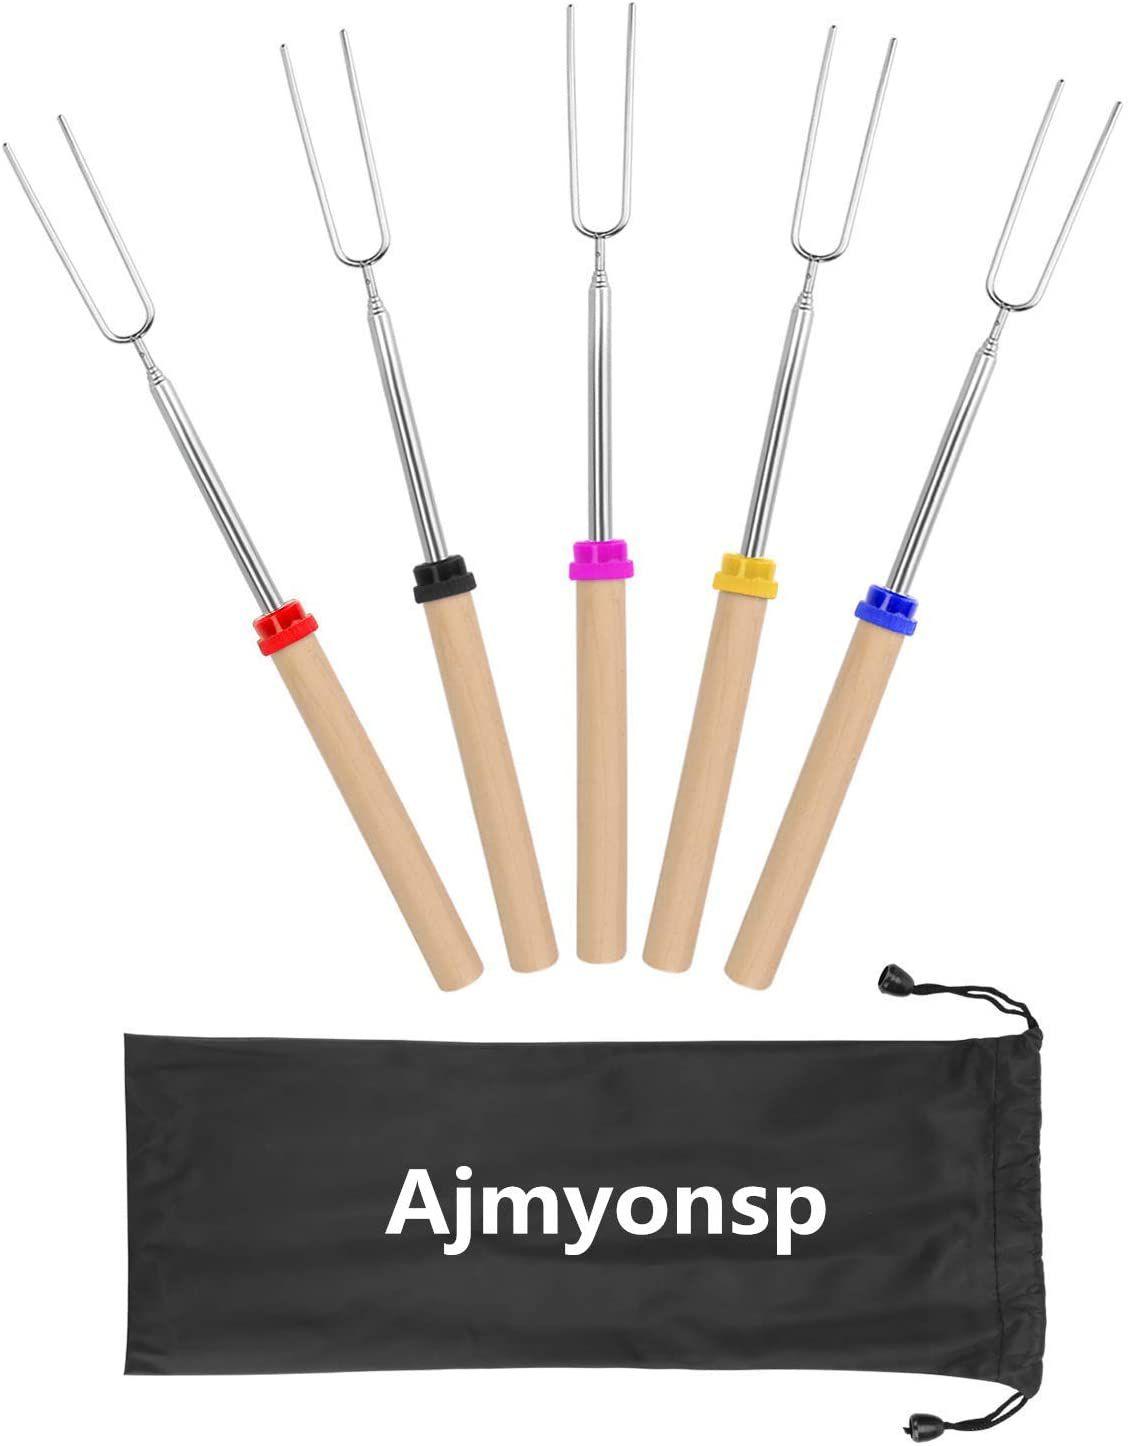 Ajmyonsp Marshmallow Roasting Sticks with Wooden Handle